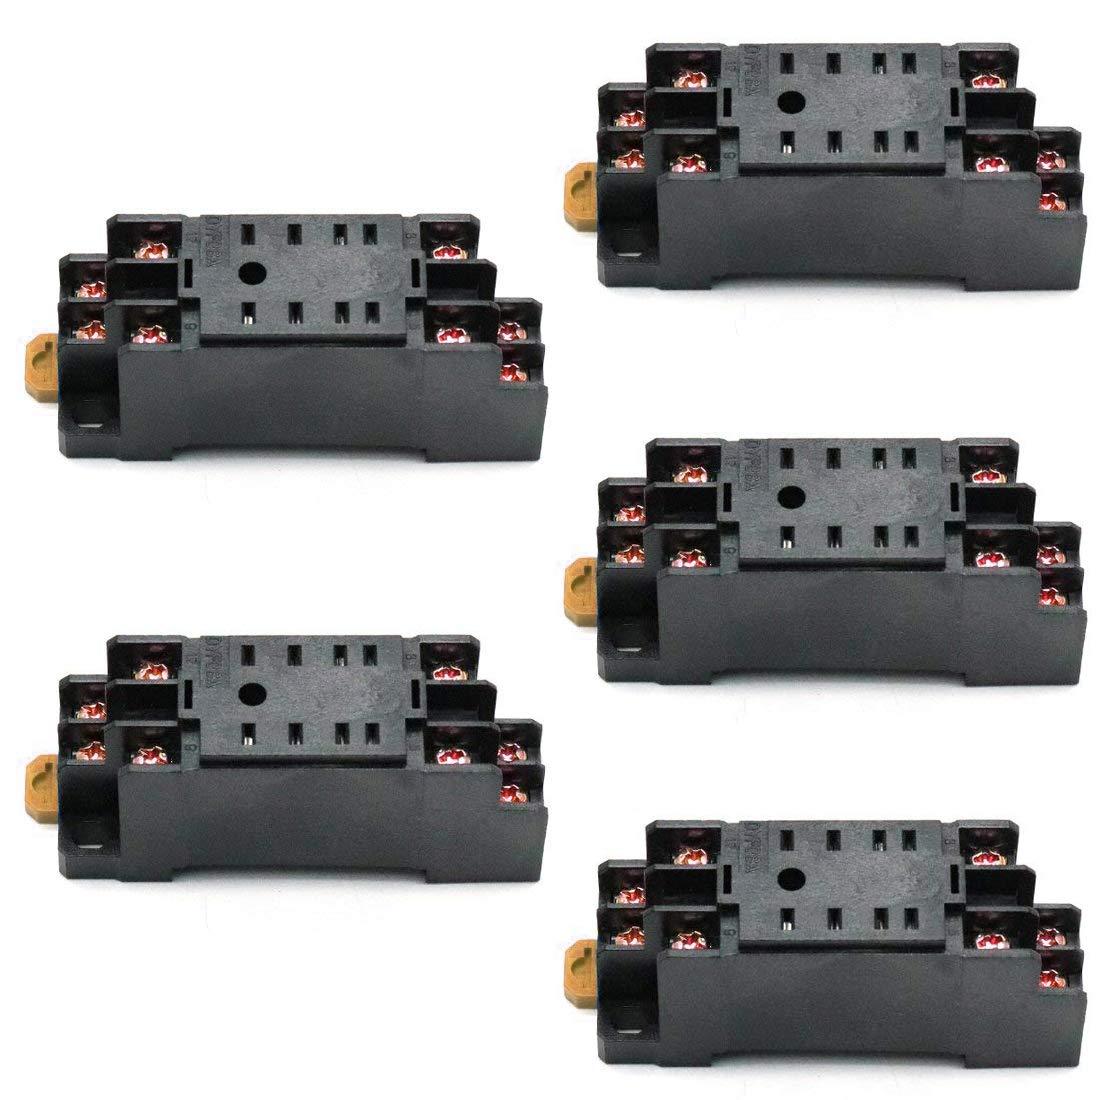 ZXHAO 35mm//1.38 inch DIN Rail Mount DYF08A 8Pin Relay Socket Base for MY2-J 5pcs